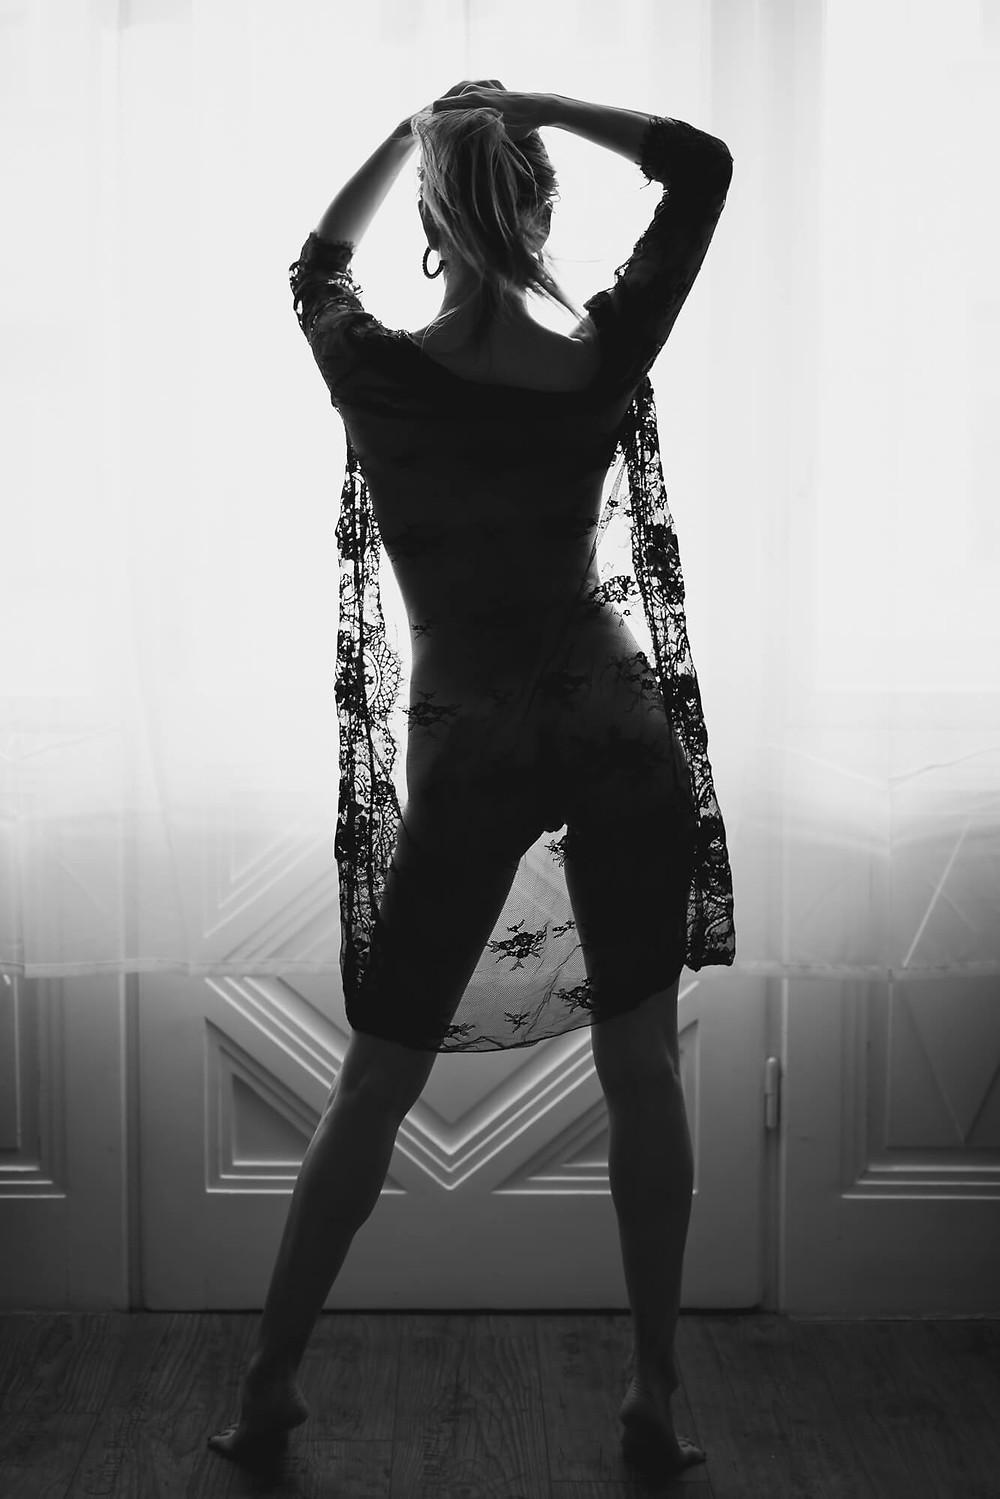 Boudoir, Boudoir Secrets, Boudoir Shooting, Foto-Shooting, Fotograf, Akt, Akt-Shooting, fünf beste Outfits, beste Outfits, beliebteste Outfits, Boudoir-Shooting, Vienna, Wien, Austria, Österreich, Robe